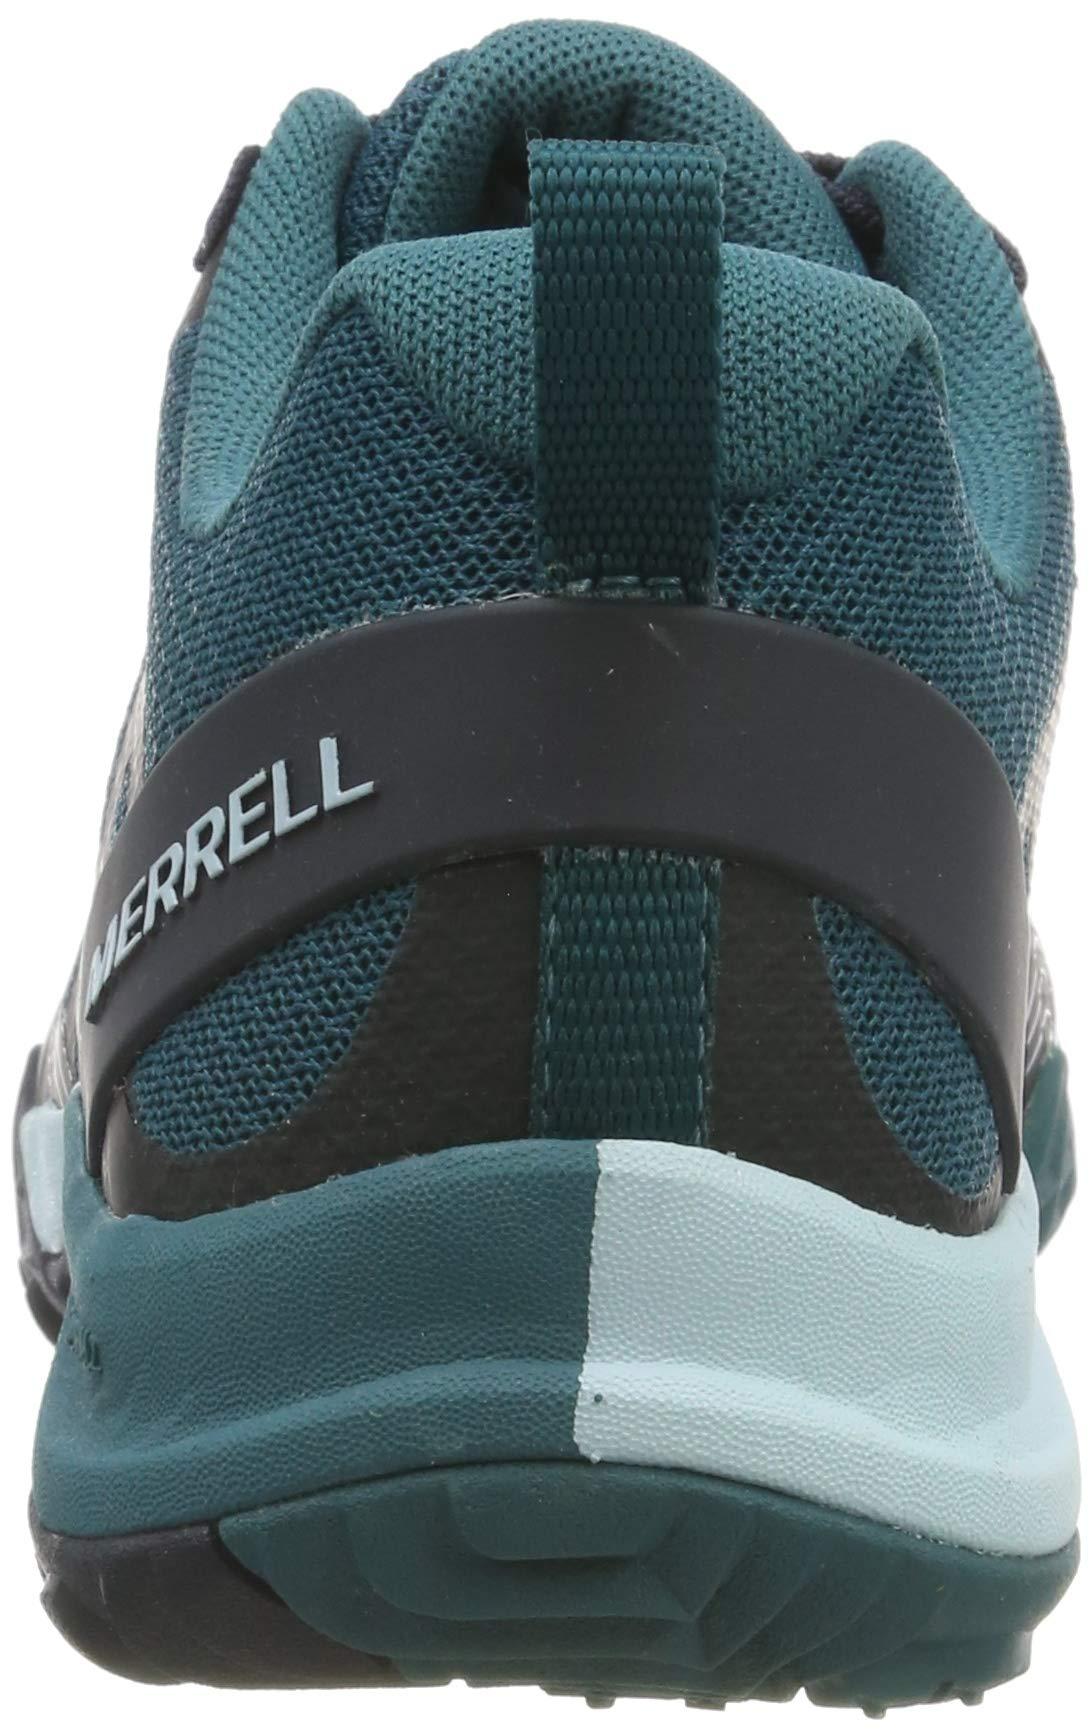 Merrell Women's Siren 3 Low Rise Trainers 2